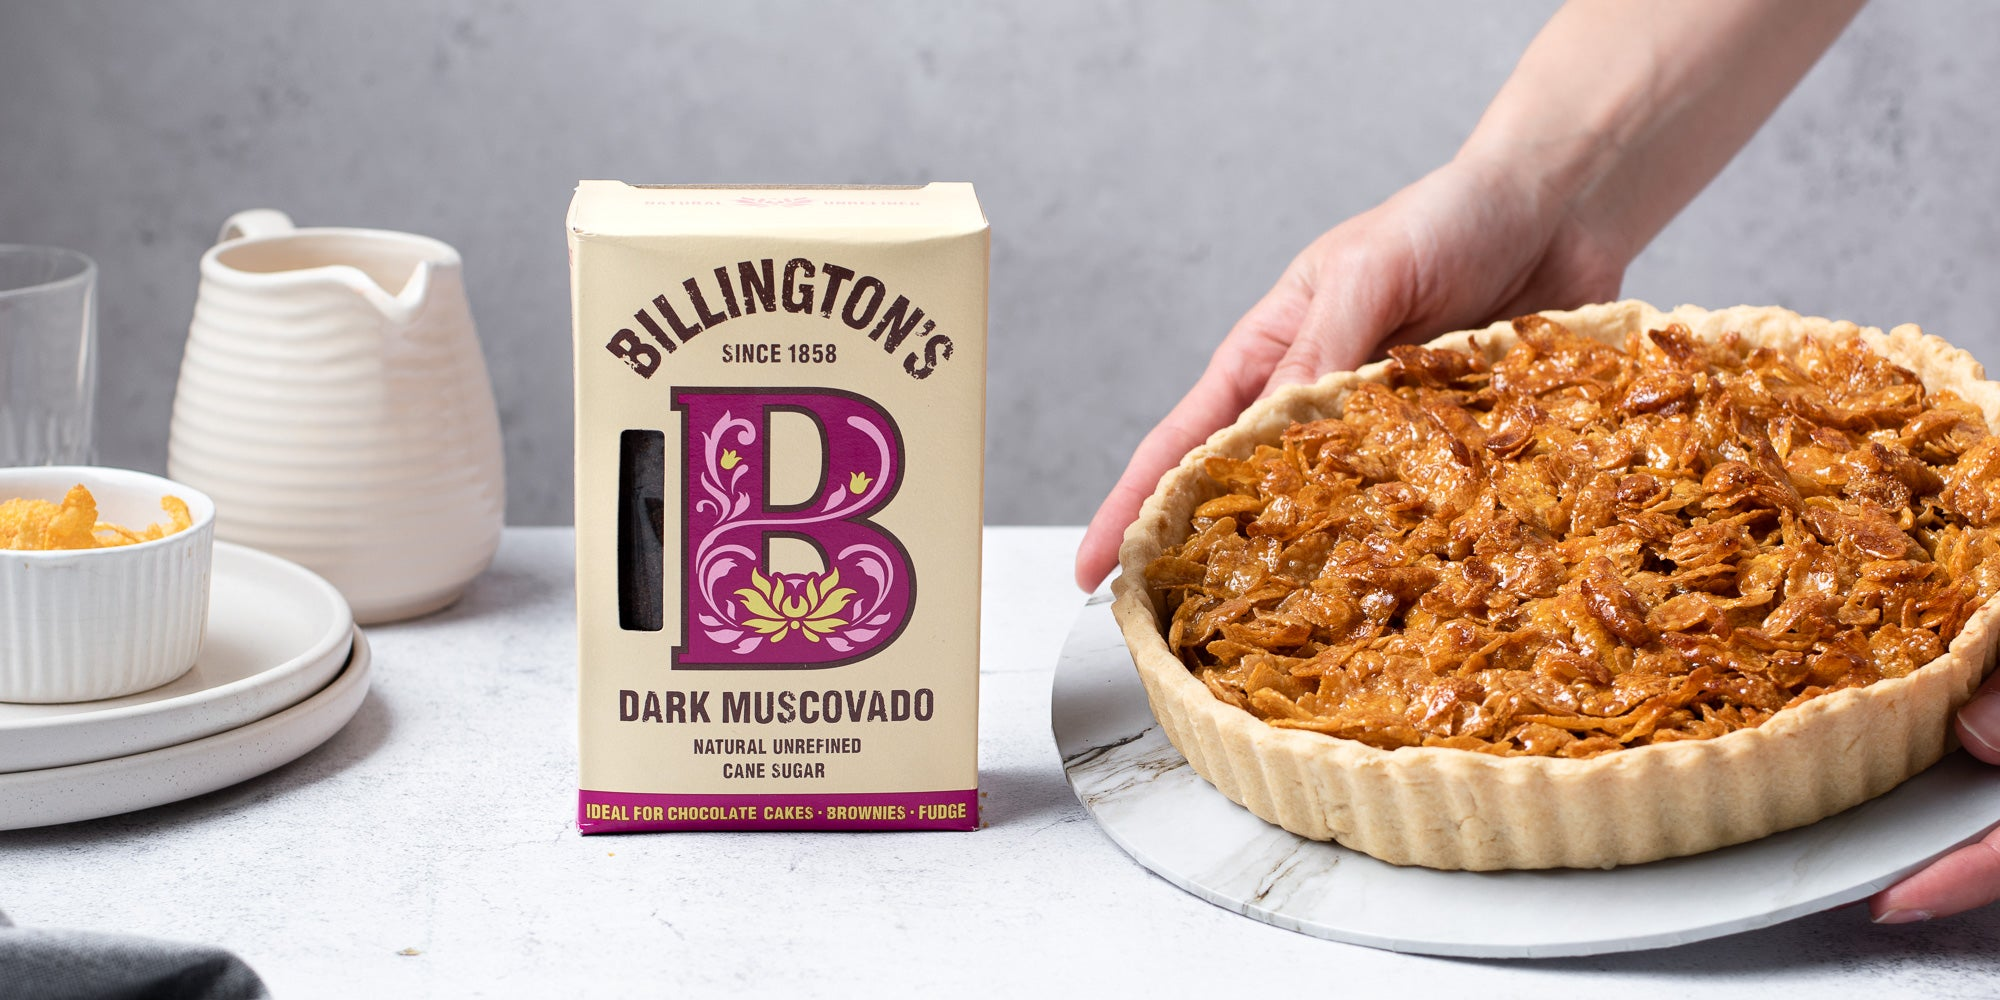 Cornflake Tart next to a box of Billington's Dark Muscovado sugar and a jug of custard